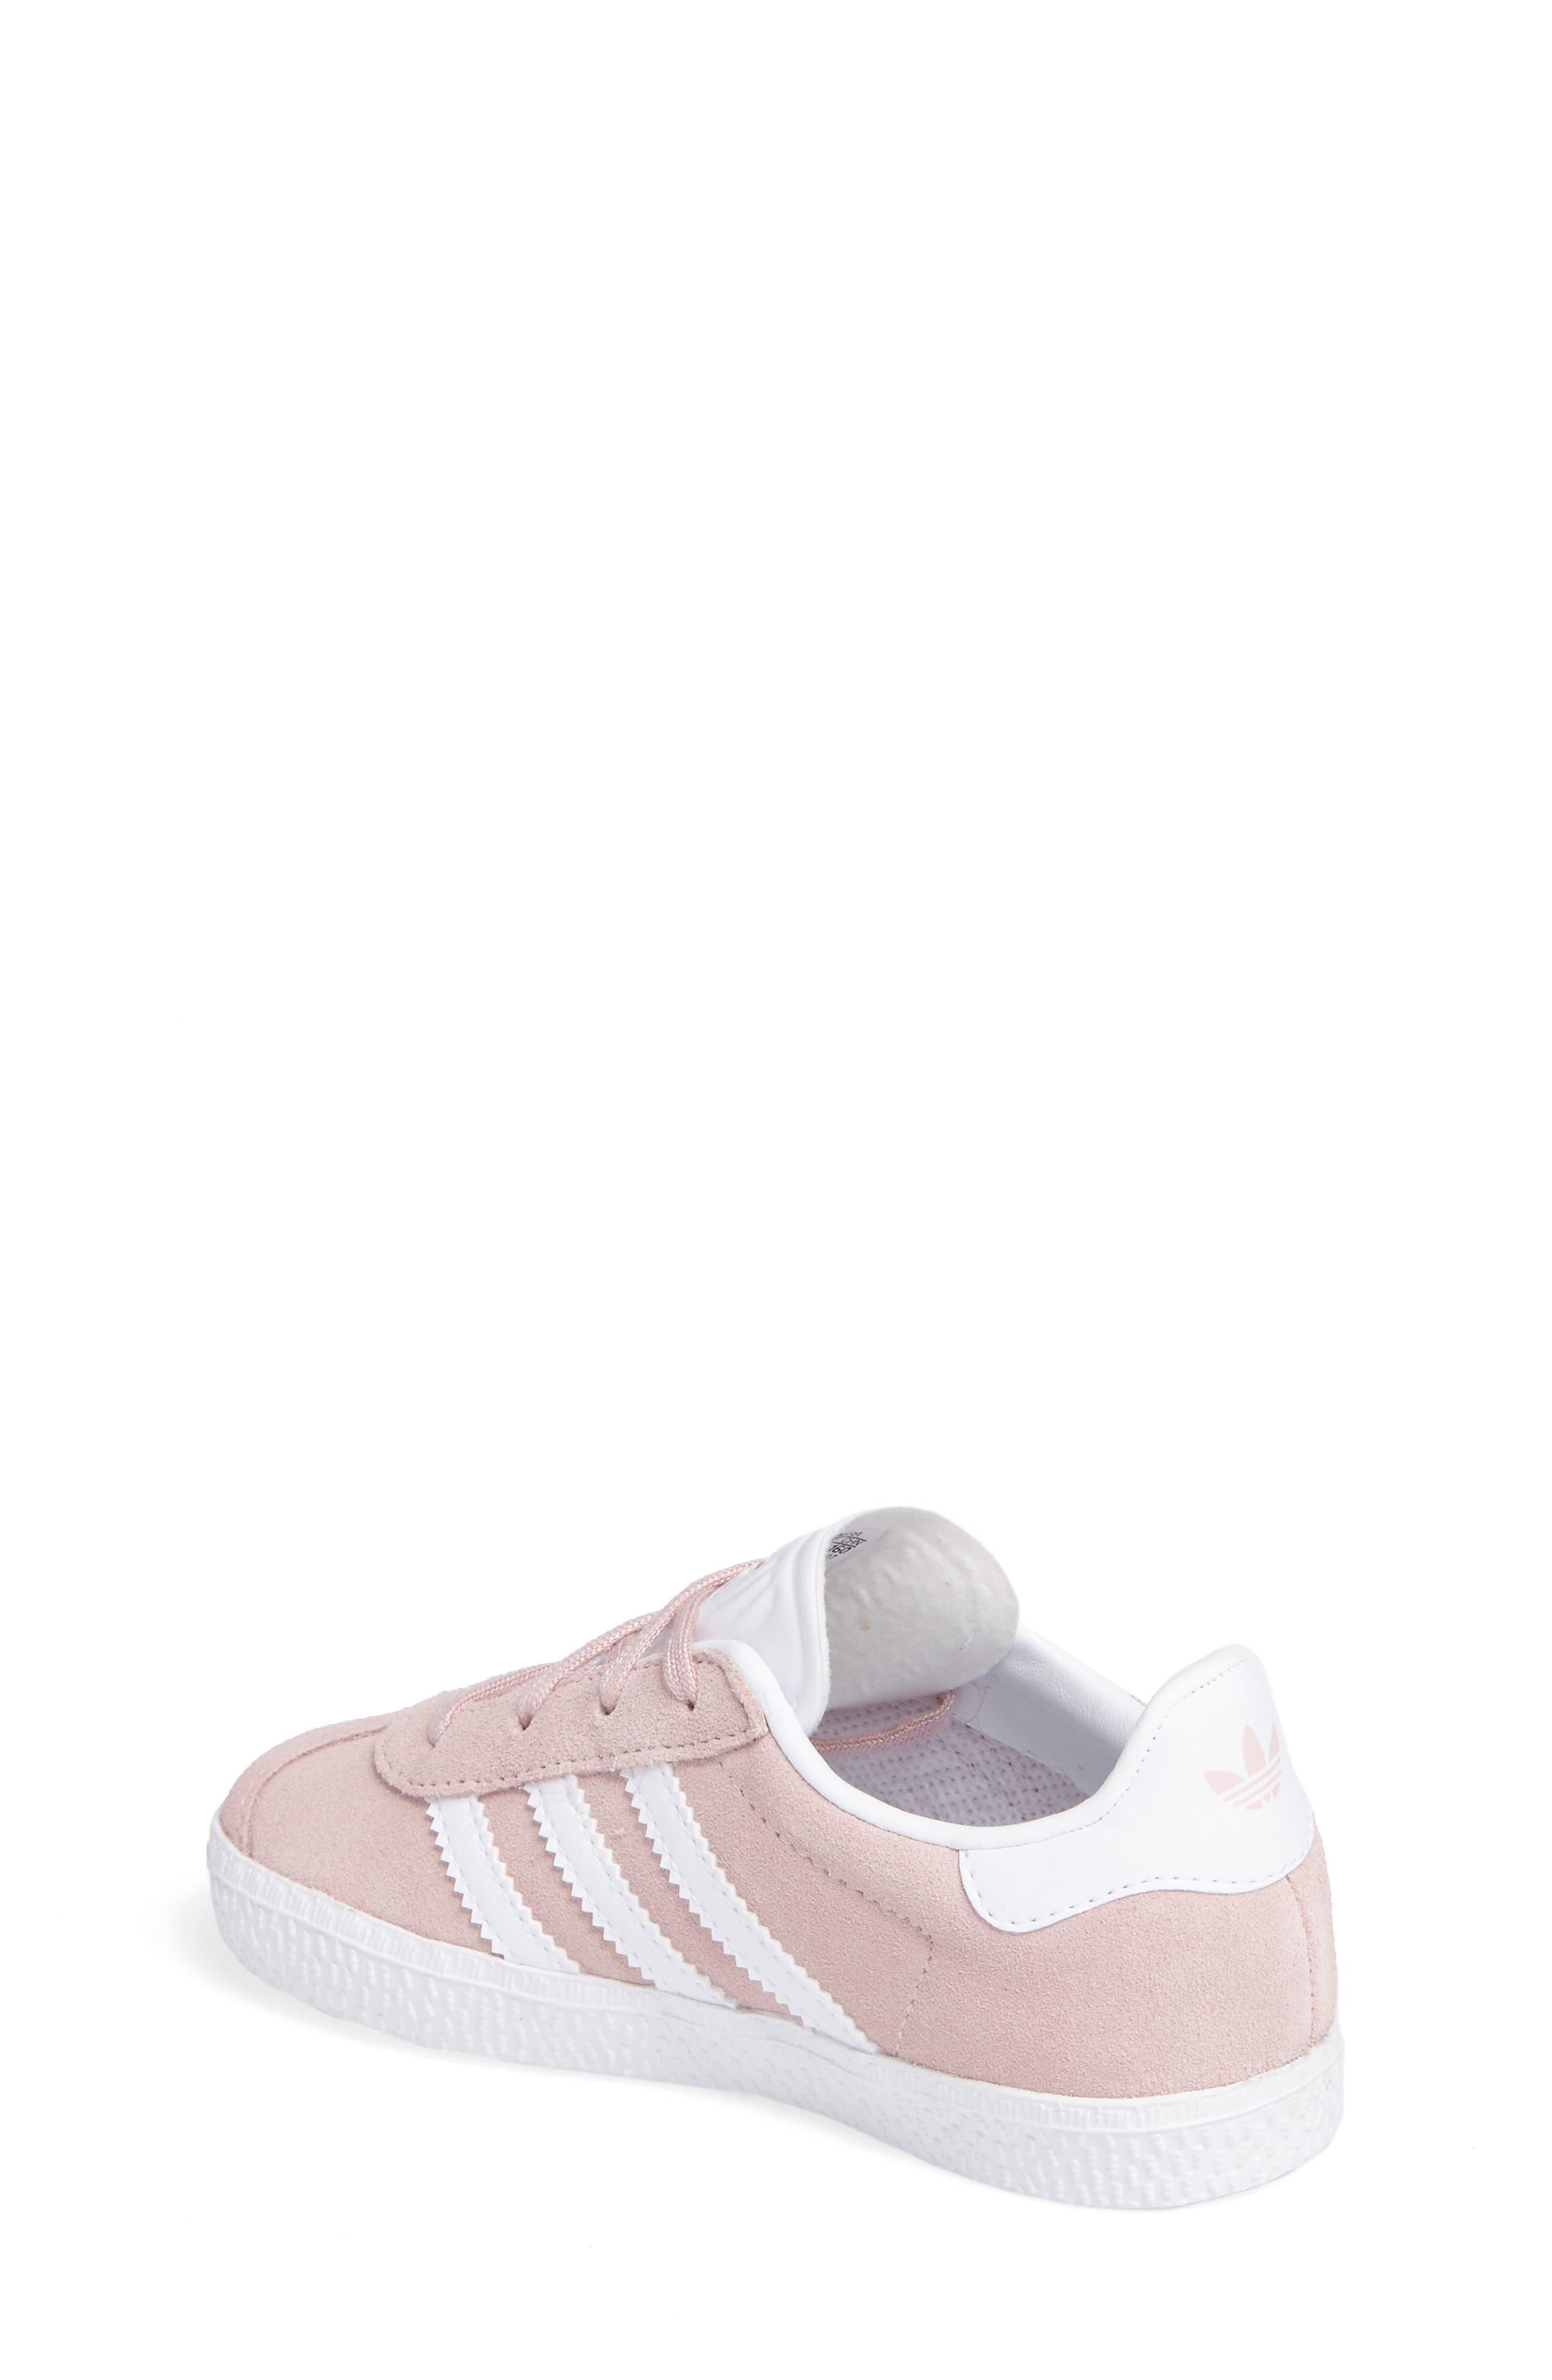 ADIDAS, Gazelle Sneaker, Alternate thumbnail 2, color, 682